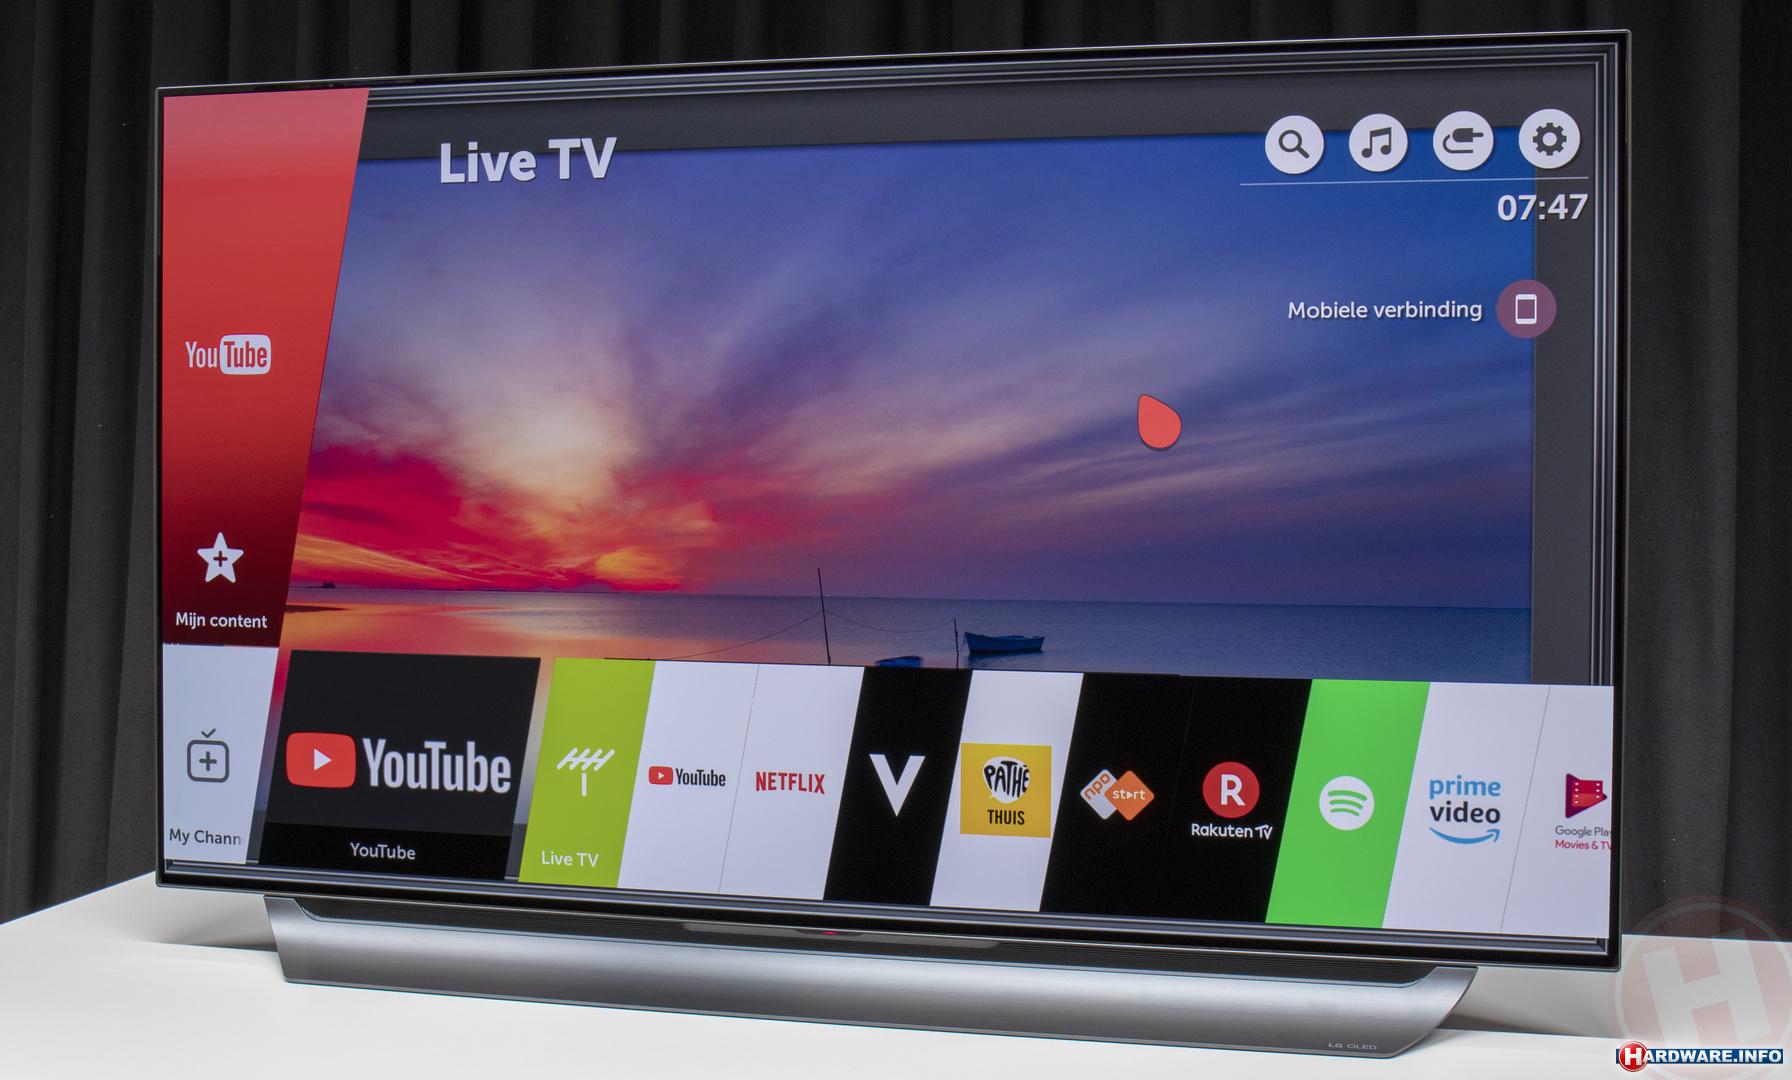 LG OLED C8 review: de beste (oled) tv van dit moment